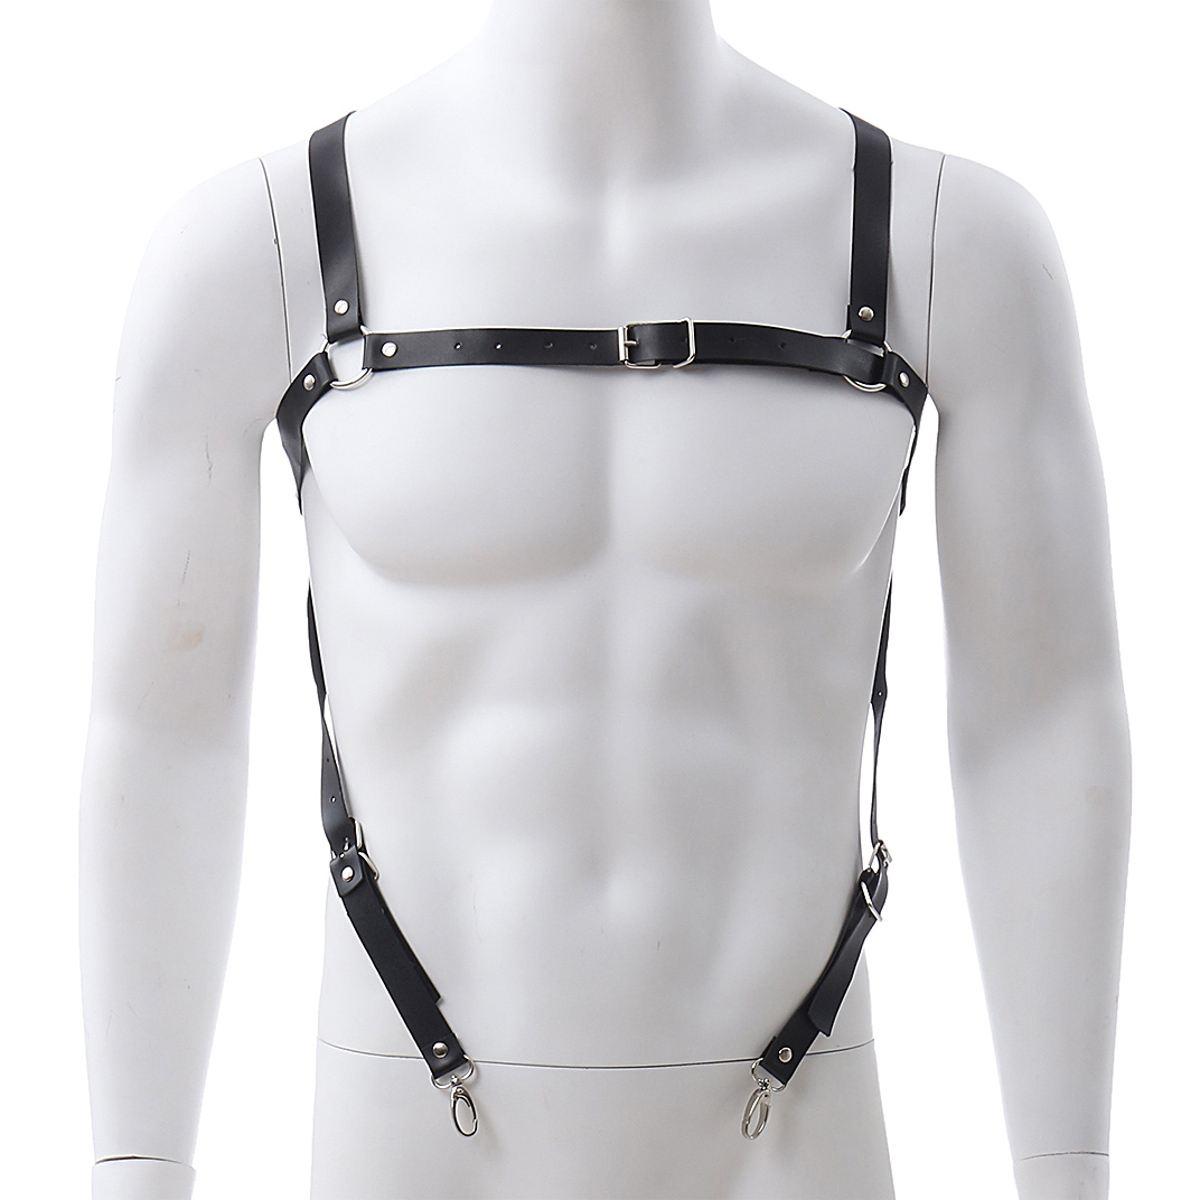 PU Leather Harness Suspenders Belt Adjustable Men PU Dancewear Body Bondage Party Costume Kit Apparel Accessories White/Black